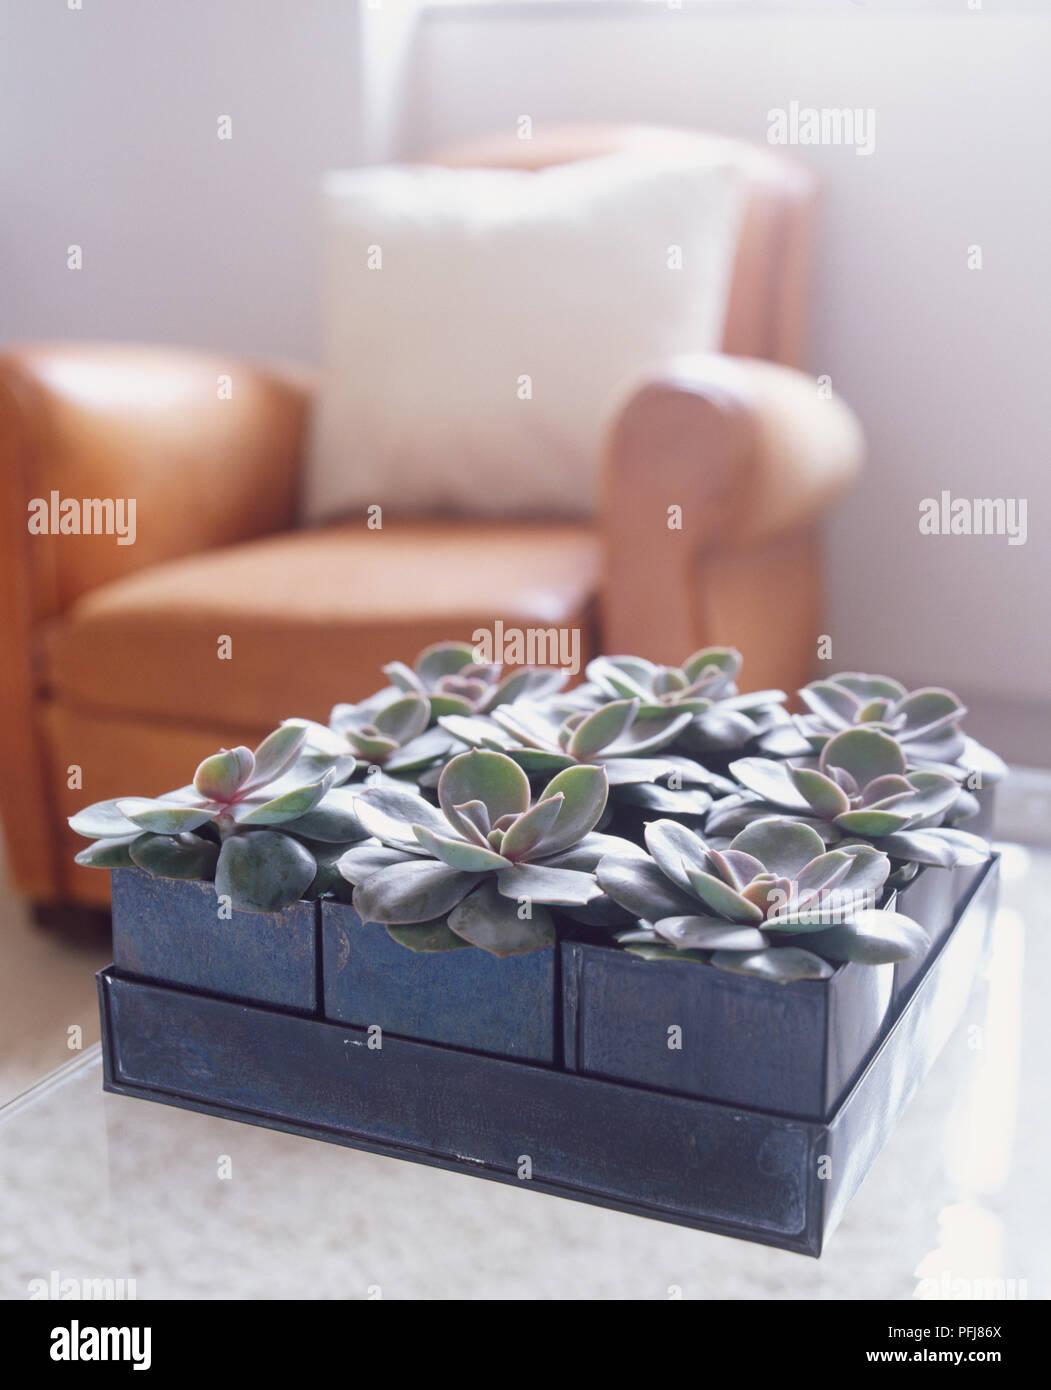 Echeveria 'Duchess of Nuremberg' plants arranged in modular square pot on living room coffee table. - Stock Image